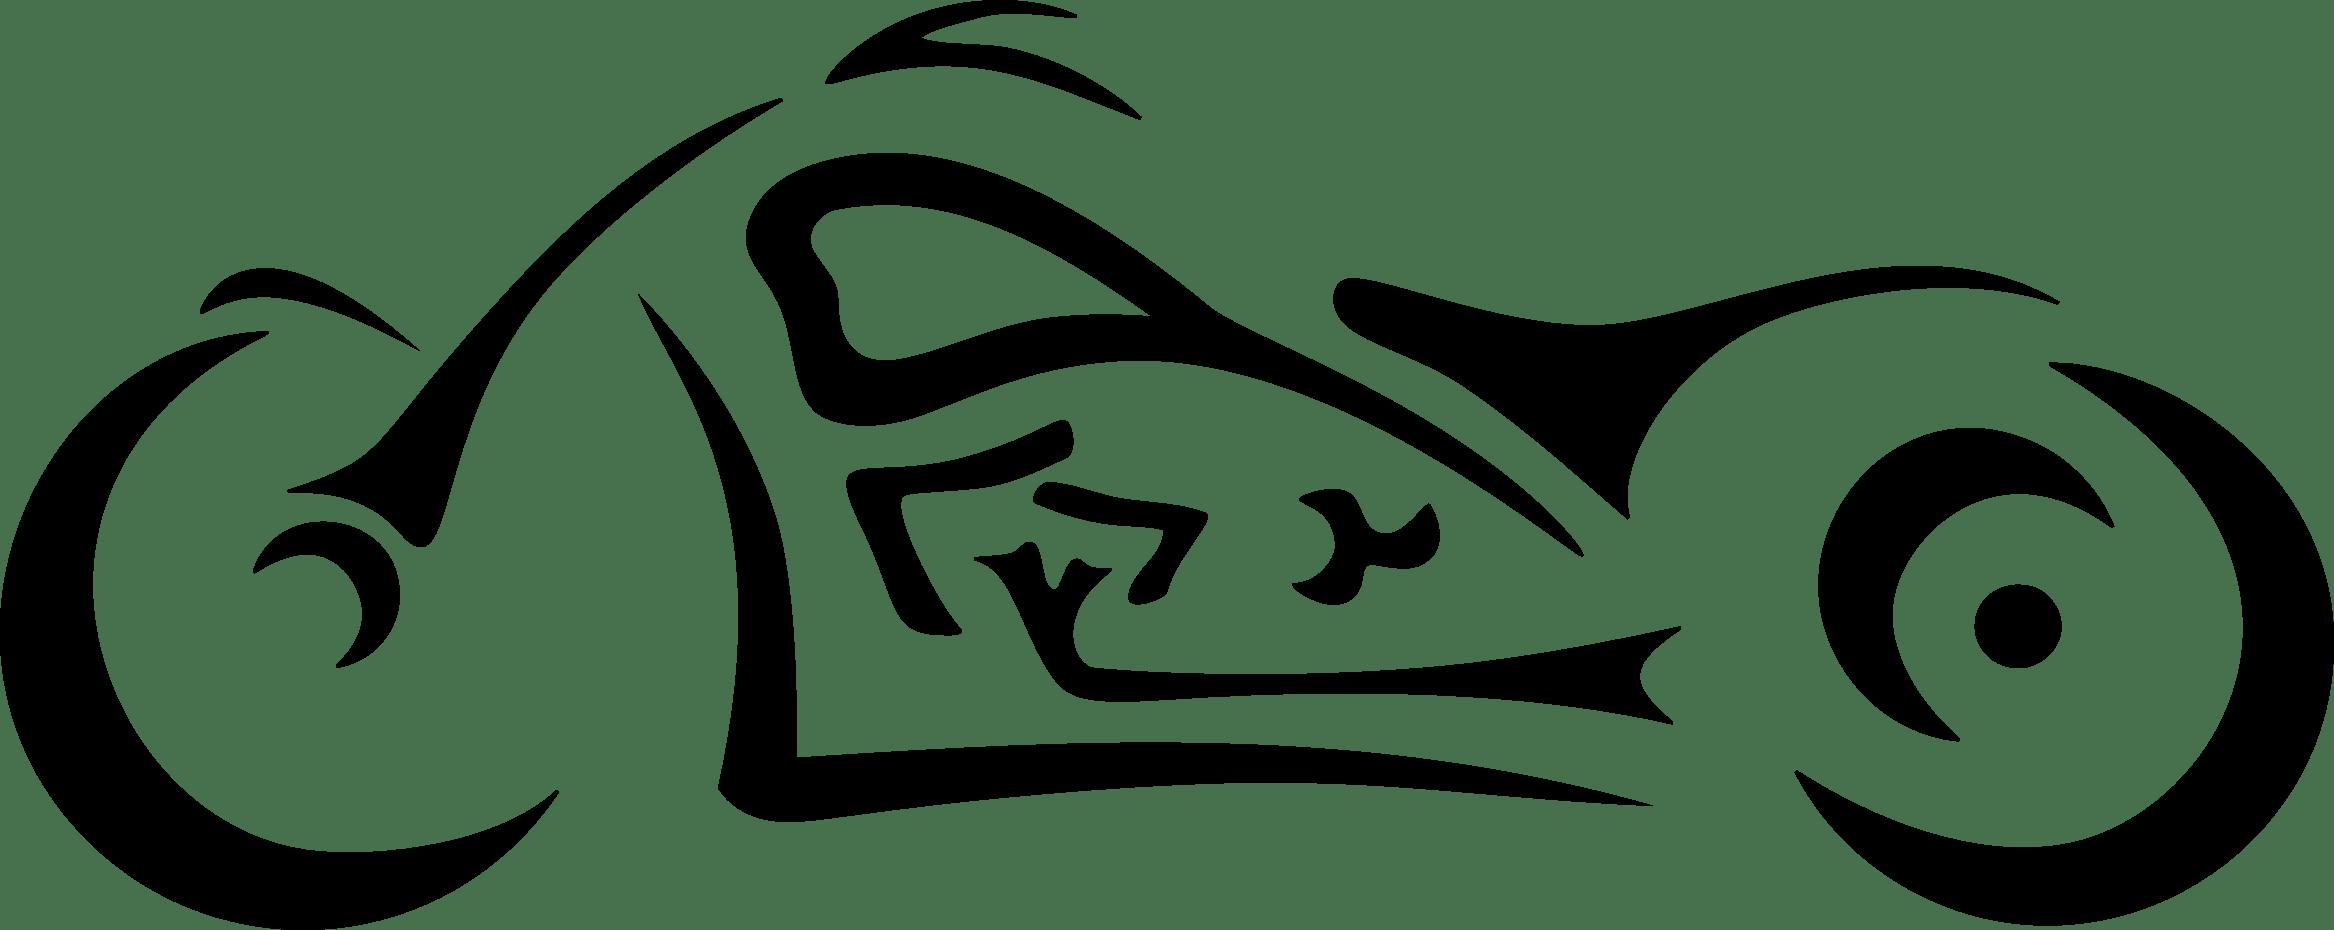 Harley Davidson Logo Silhouette At Getdrawings